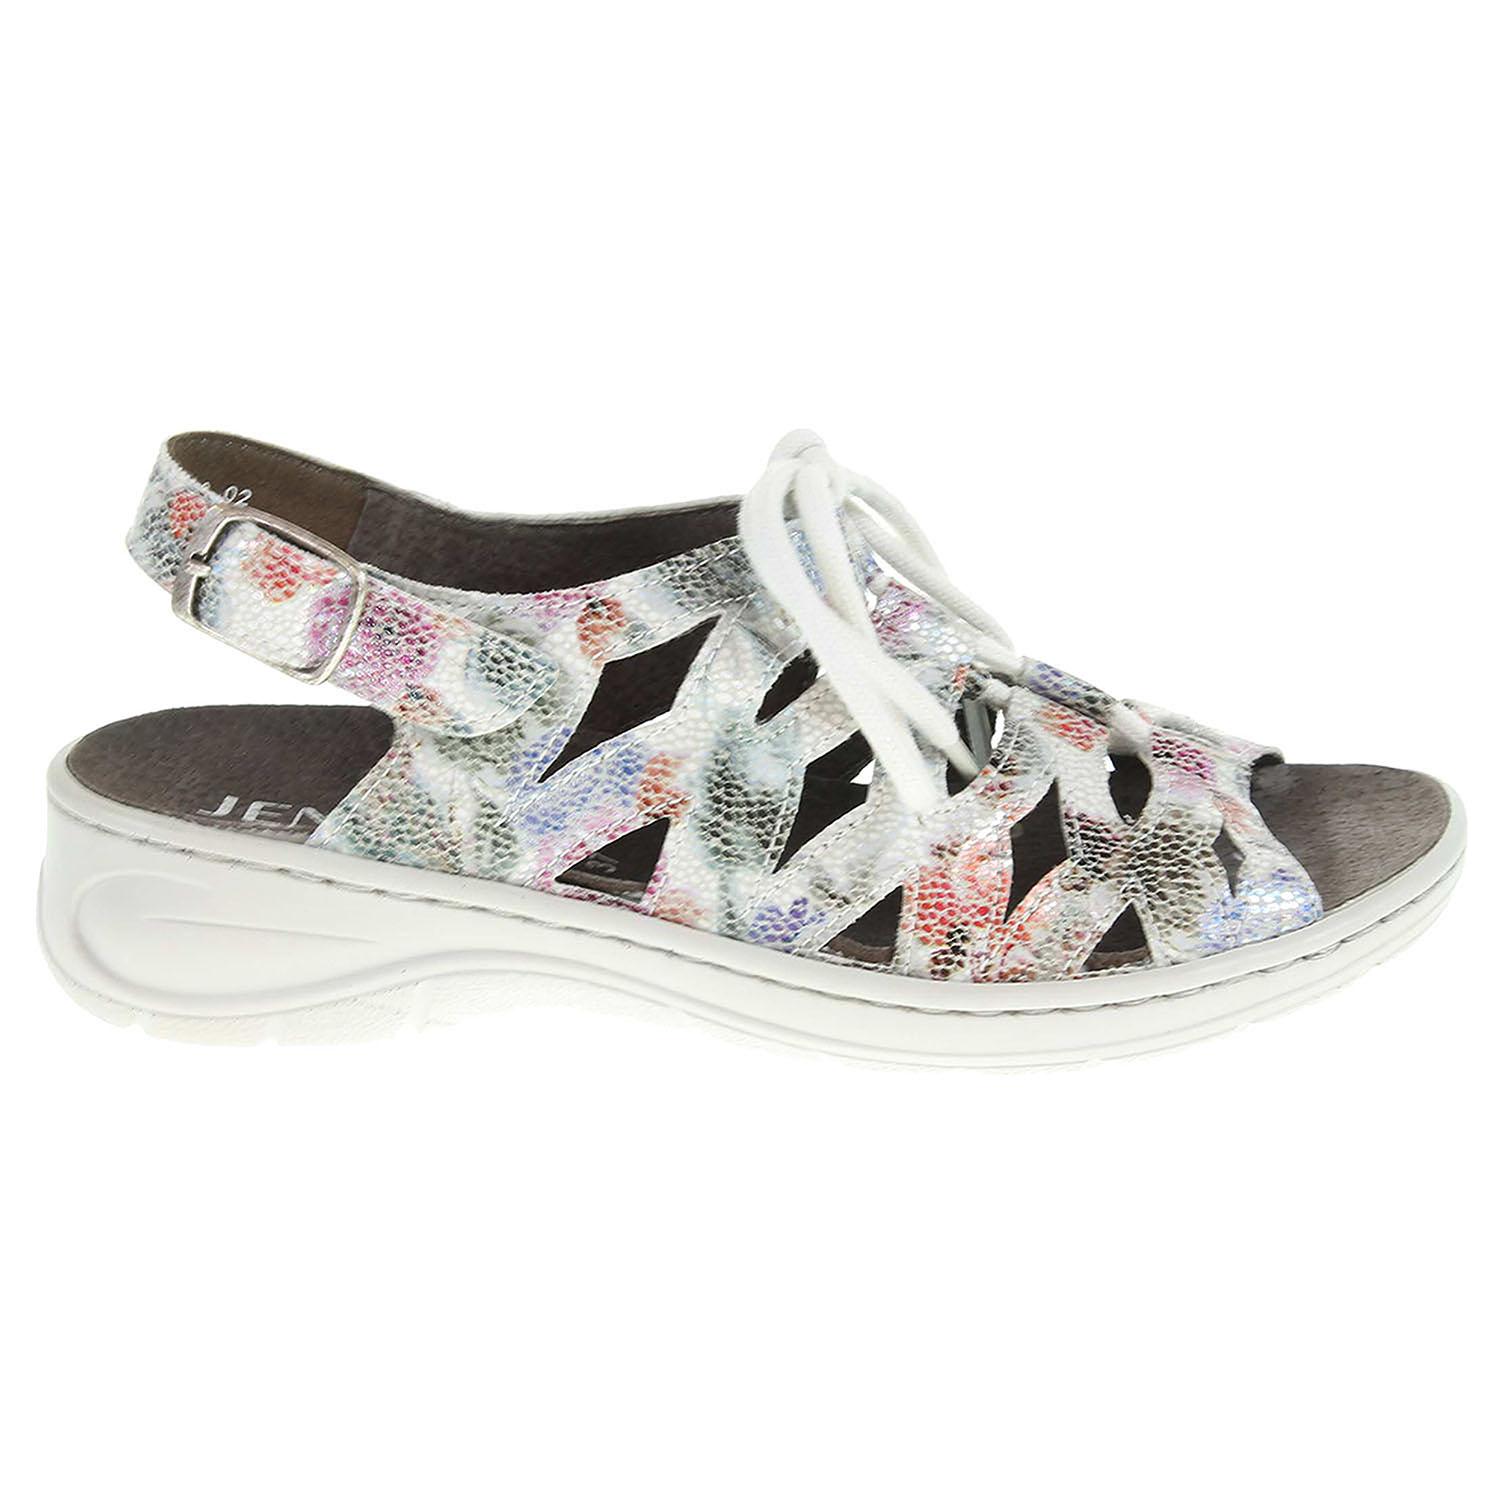 Ecco Ara dámské sandály 56550-02 multi 23801145